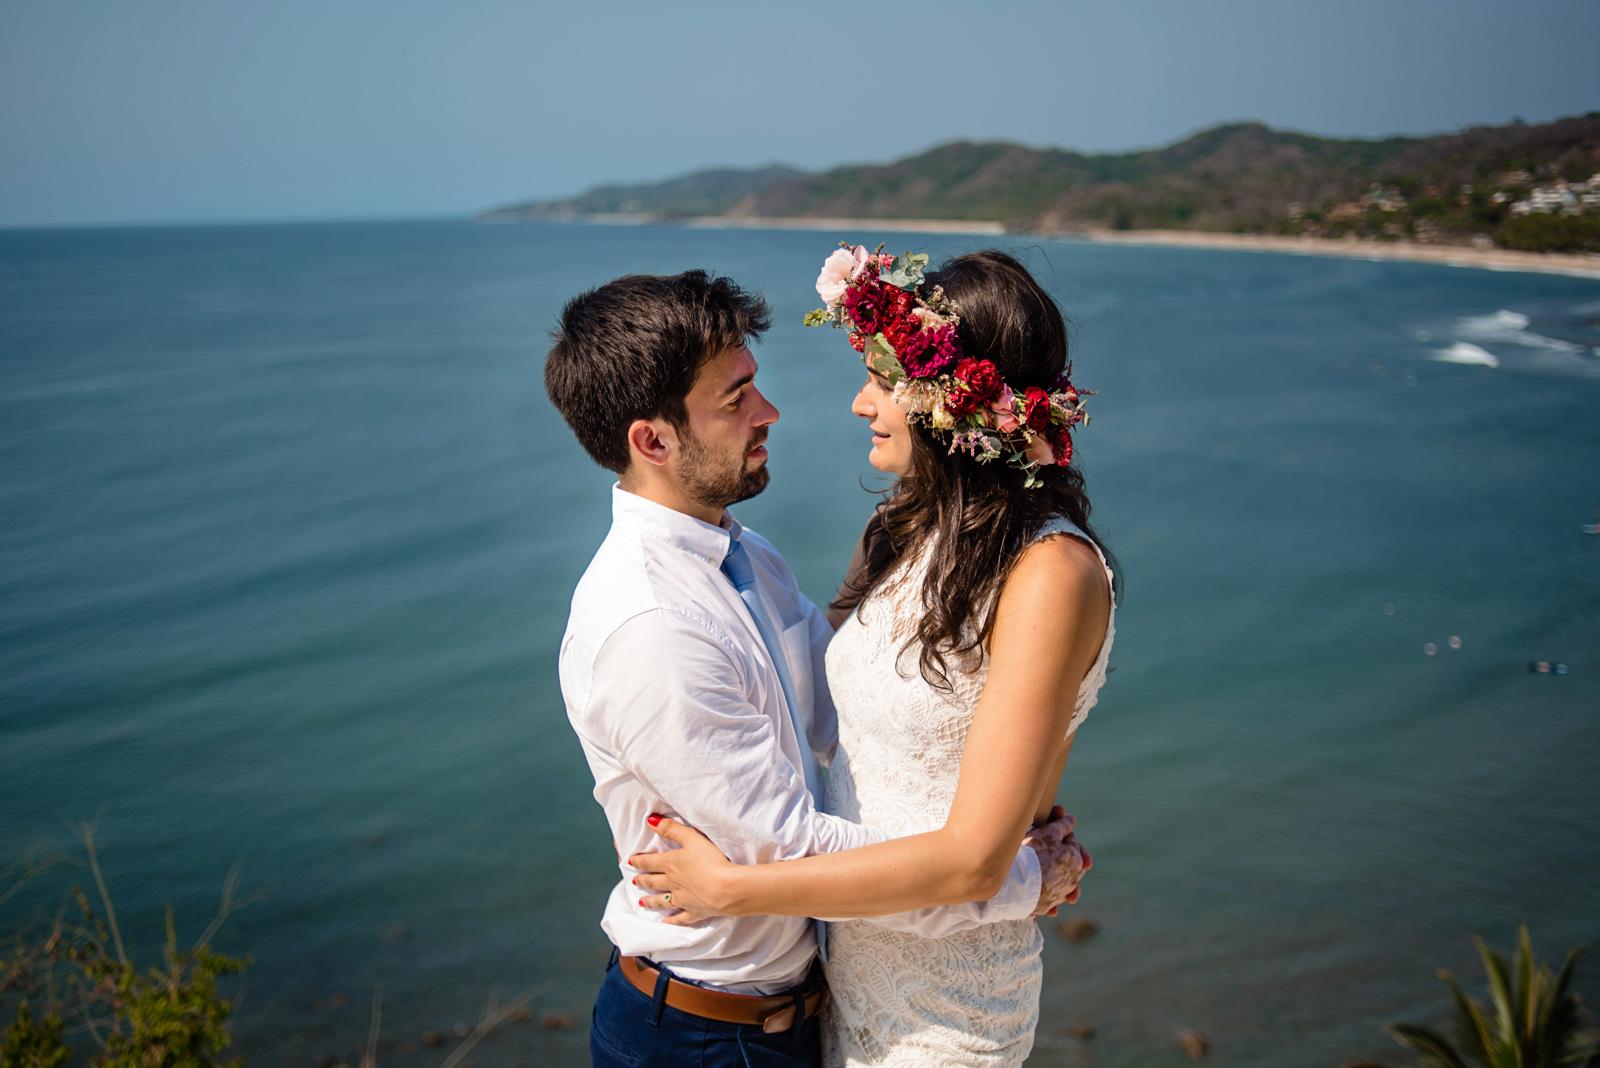 Villa-amor-sayulita-destination-wedding-mexico-030